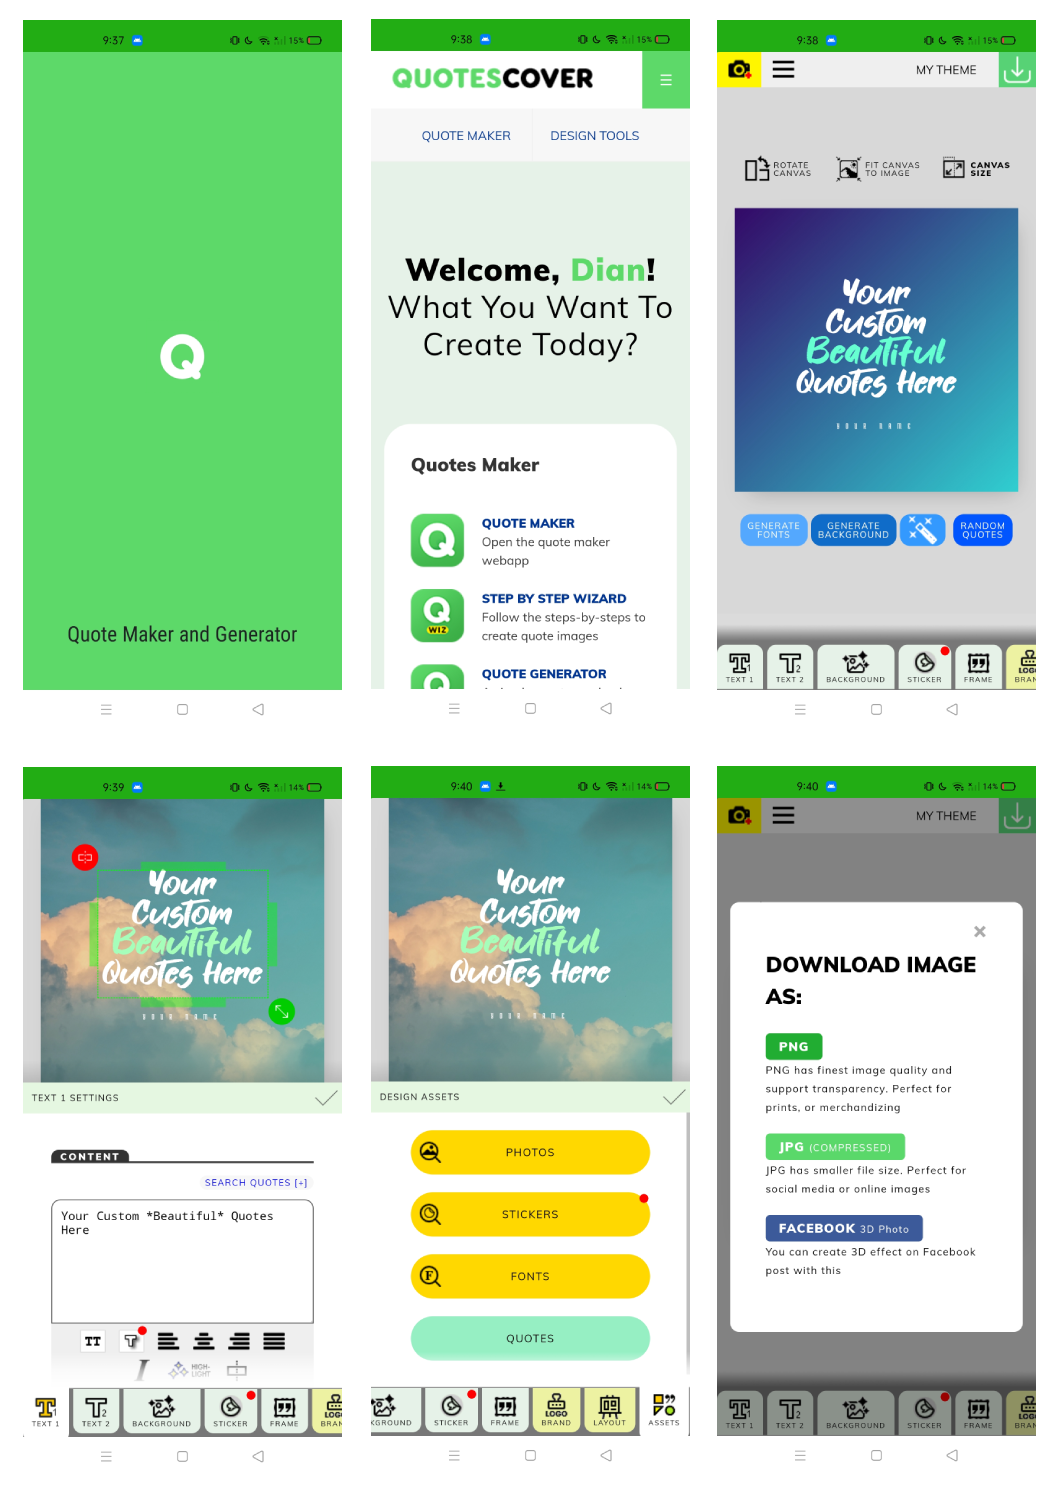 Members Page Screenshot: Mobile view